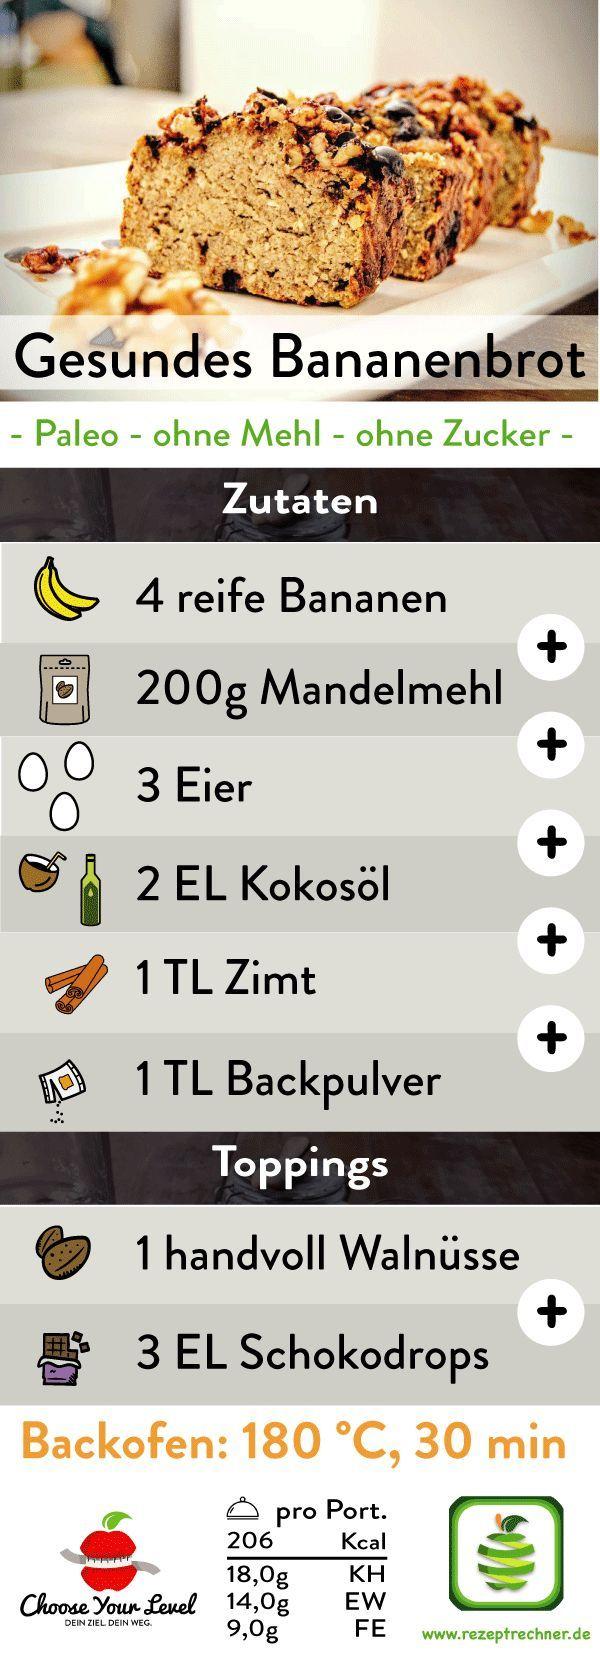 Bananenbrot ohne Mehl - Choose Your Level™ #bananabread